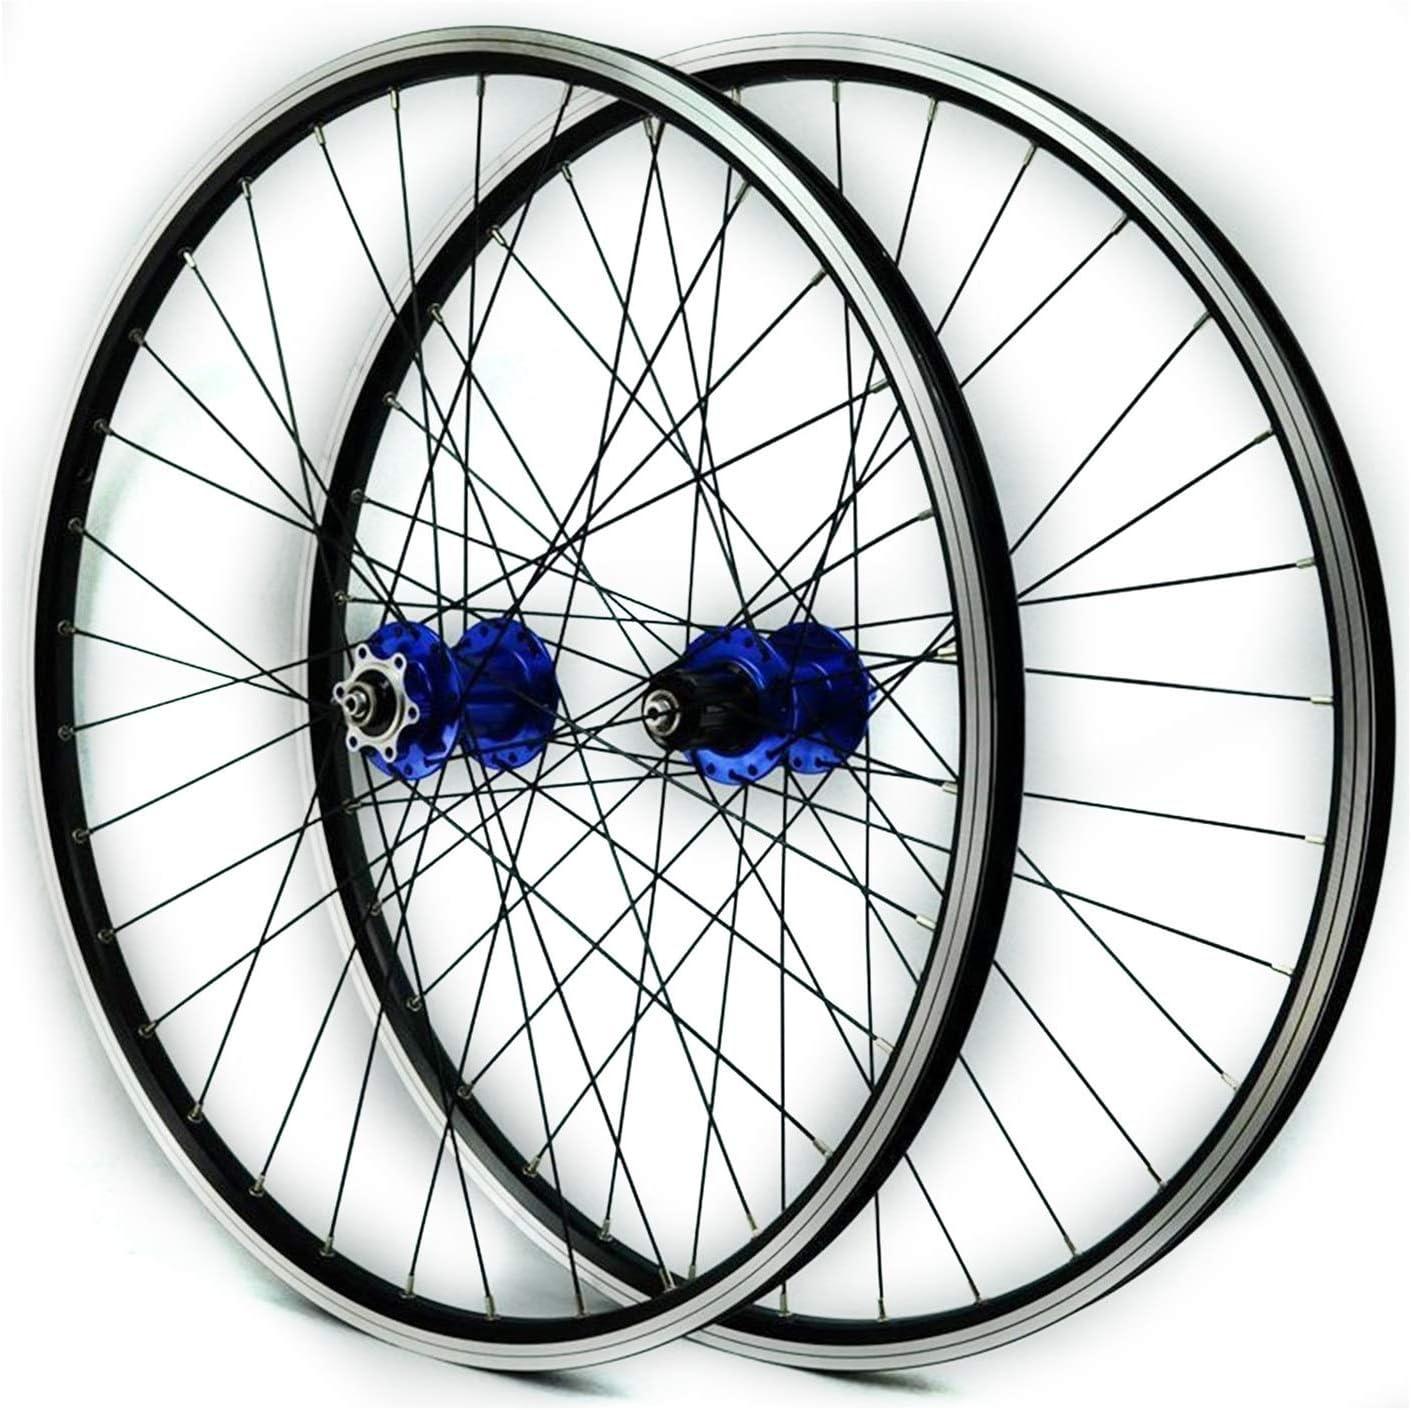 55% OFF Soldering ZCXBHD MTB Front Rear Wheel 26 Bike Bea Mountain Wheelset Sealed